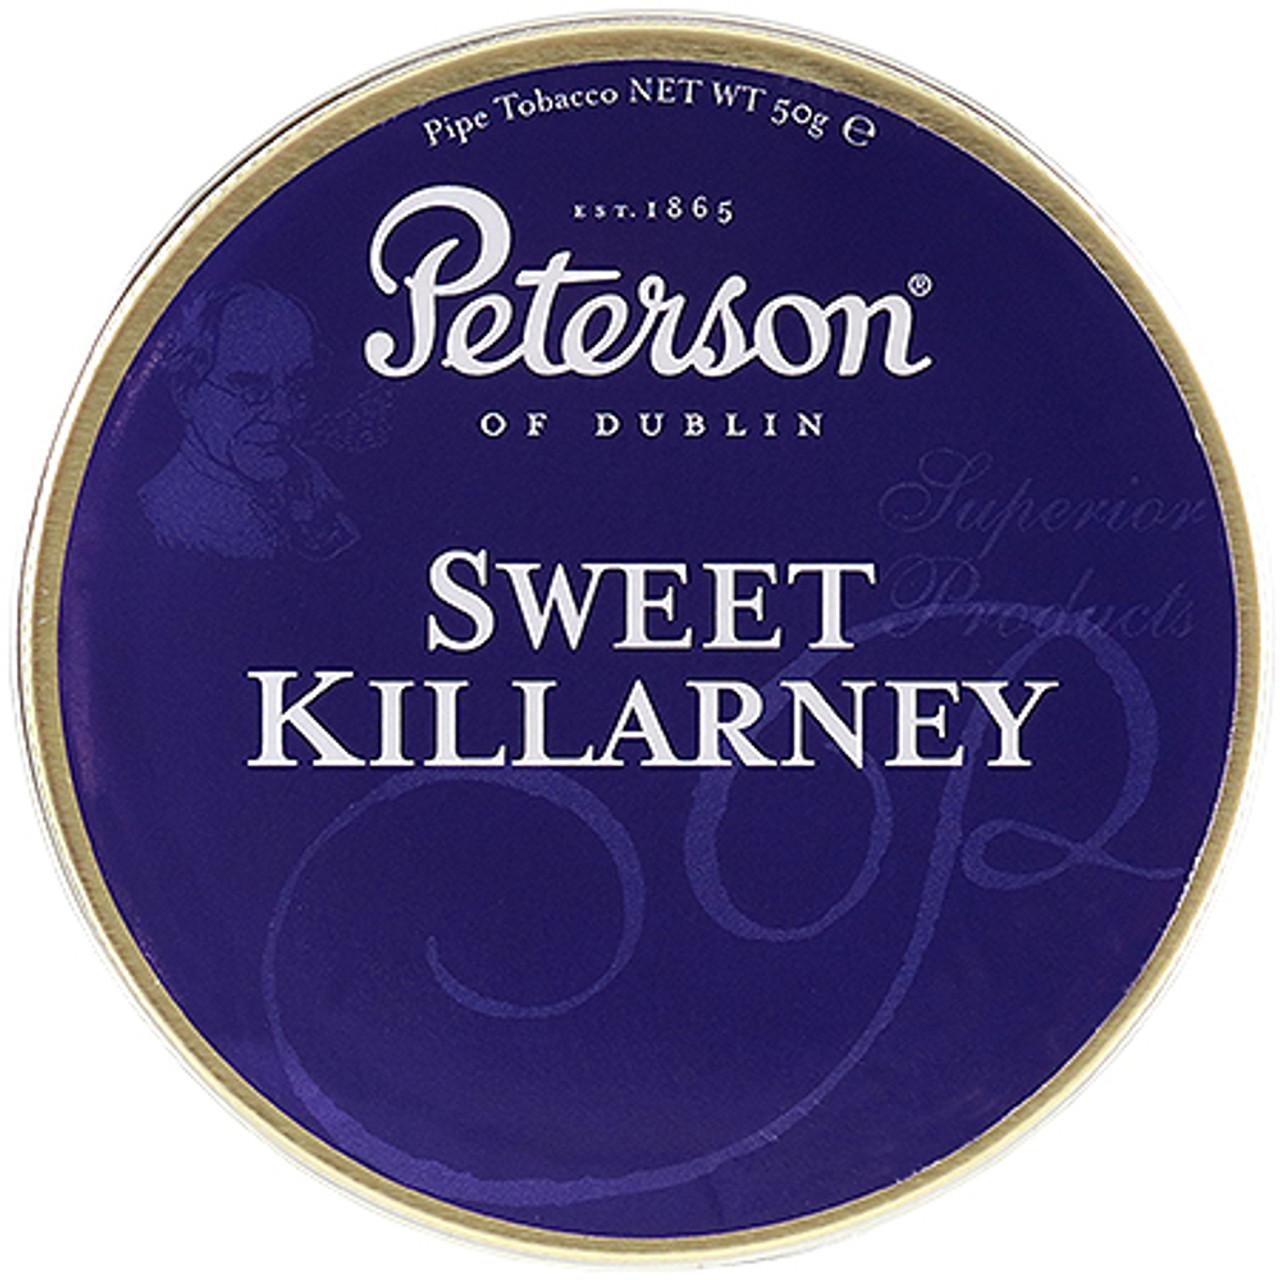 Peterson Sweet Killarney Pipe Tobacco | 1.75 OZ TIN